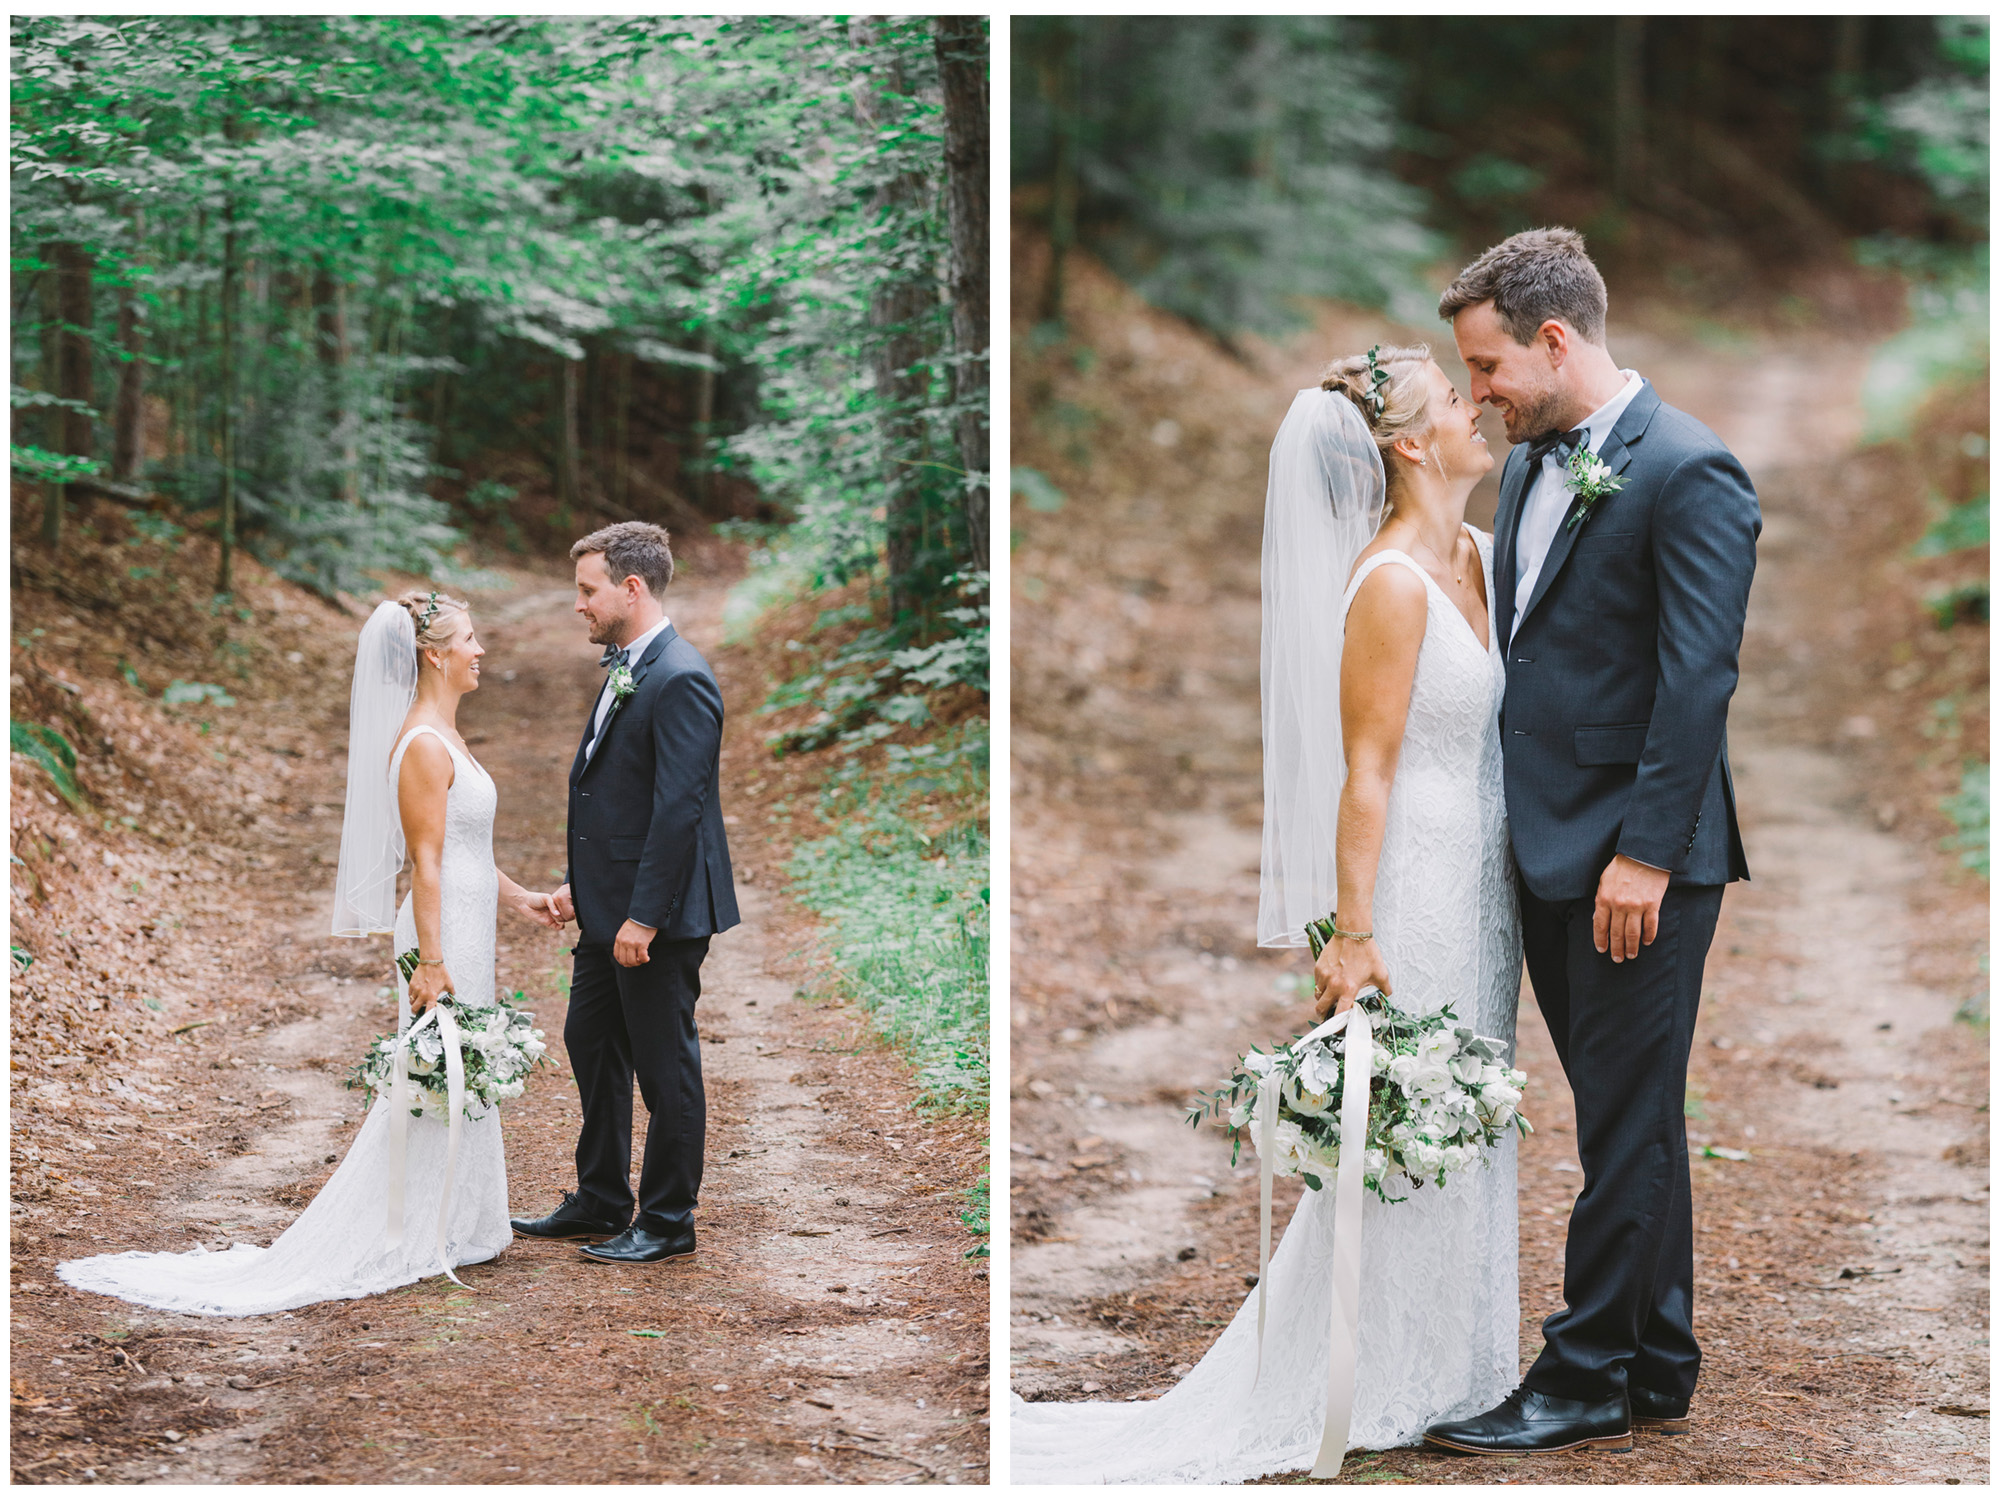 Wedding couple walking through the woods at Drysdale's Tree Farm